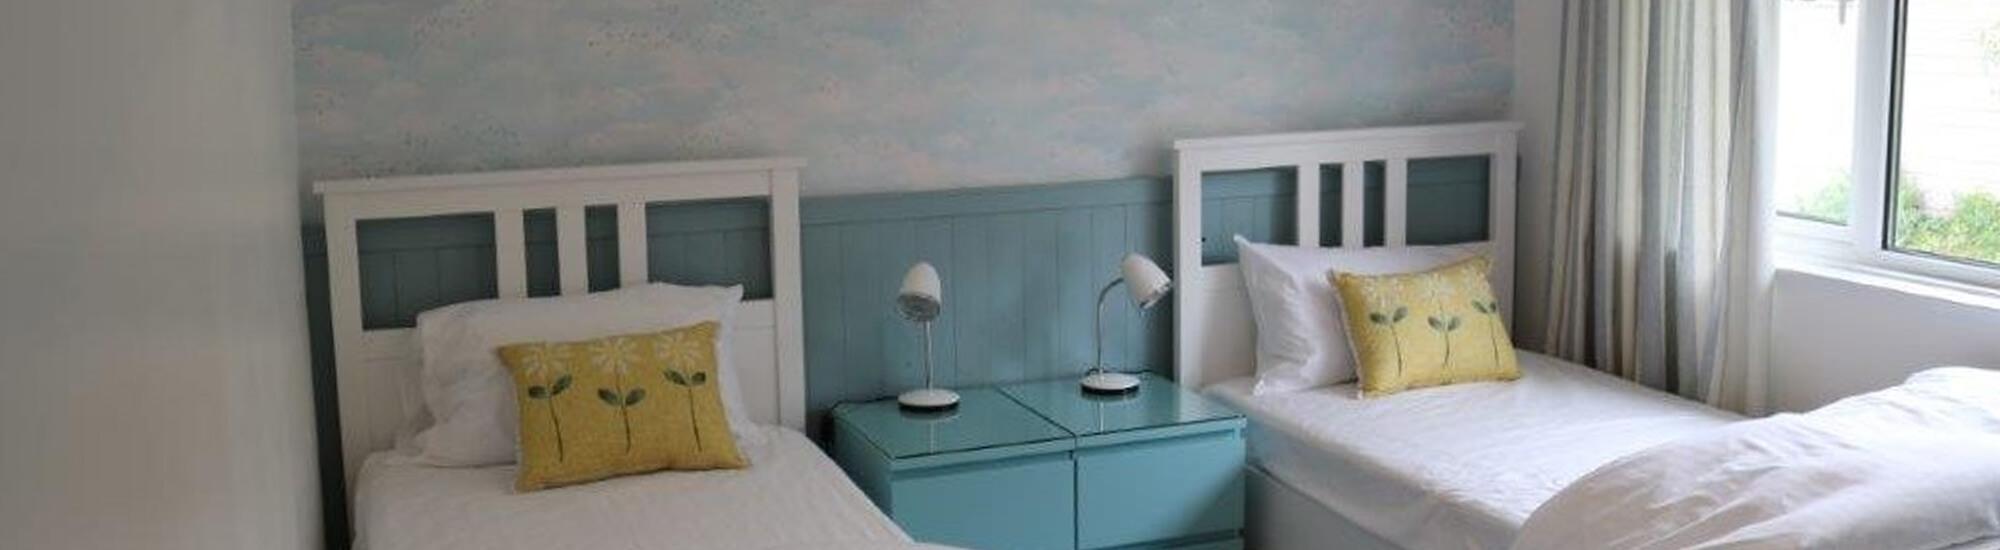 langarrow - Langarrow Cottage